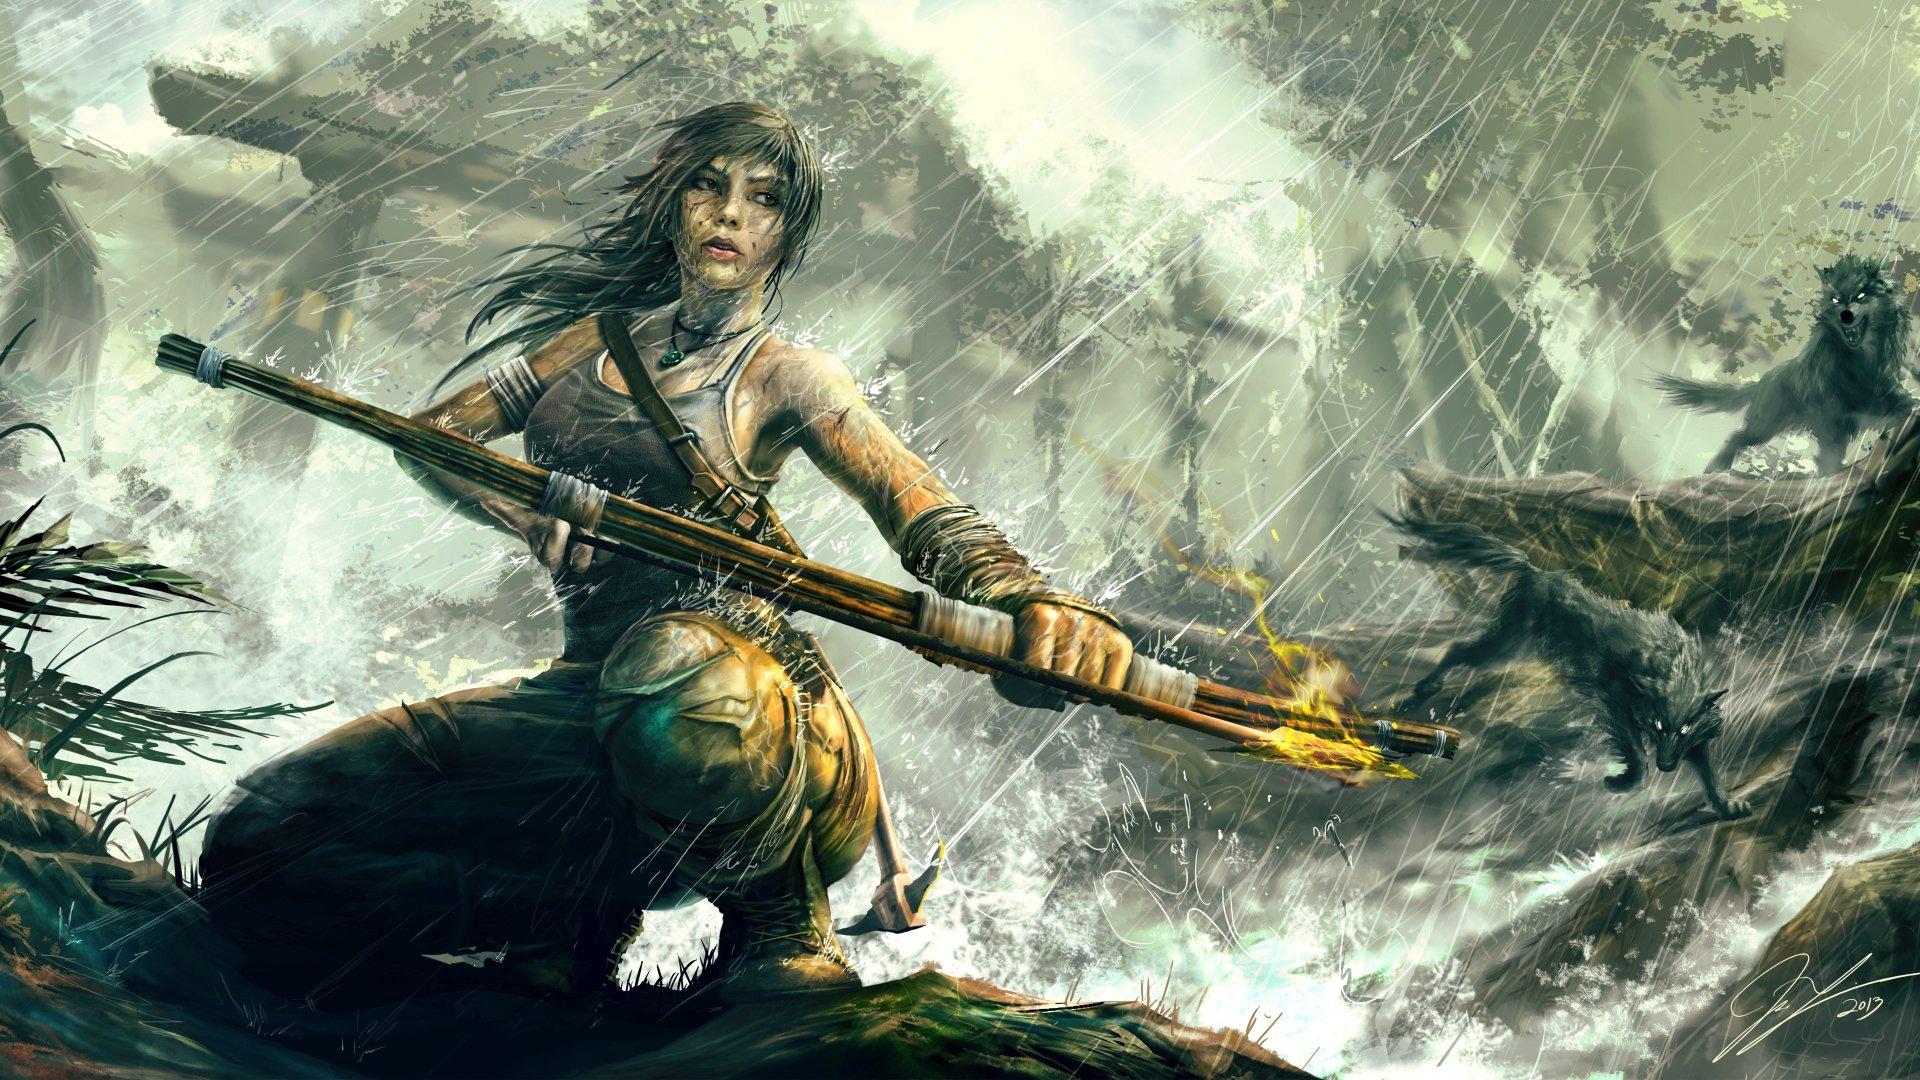 thumb-1920-548905.jpg - Tomb Raider (2013)